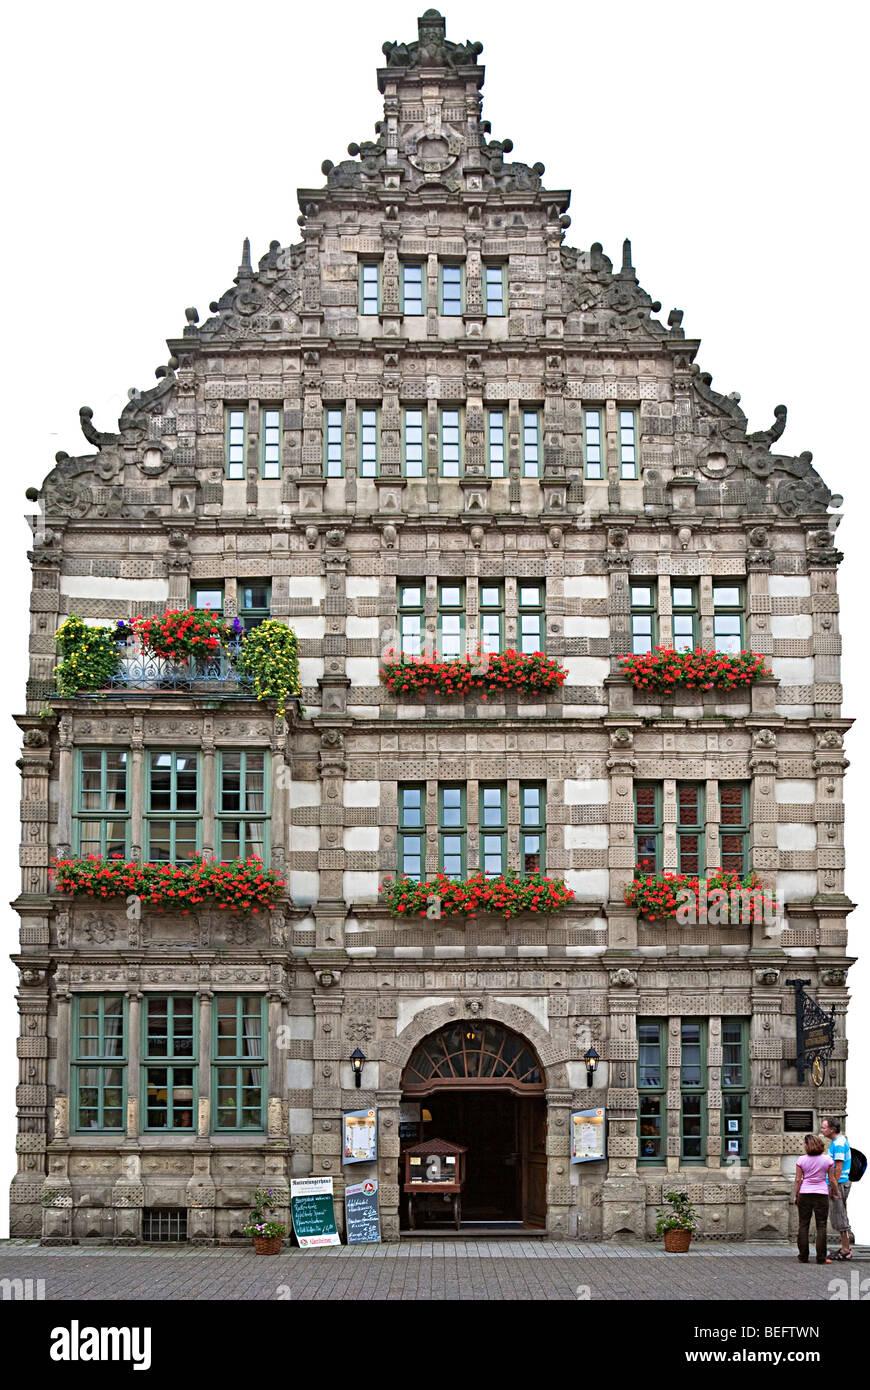 Rattenfanger house Hamelin Germany Stock Photo